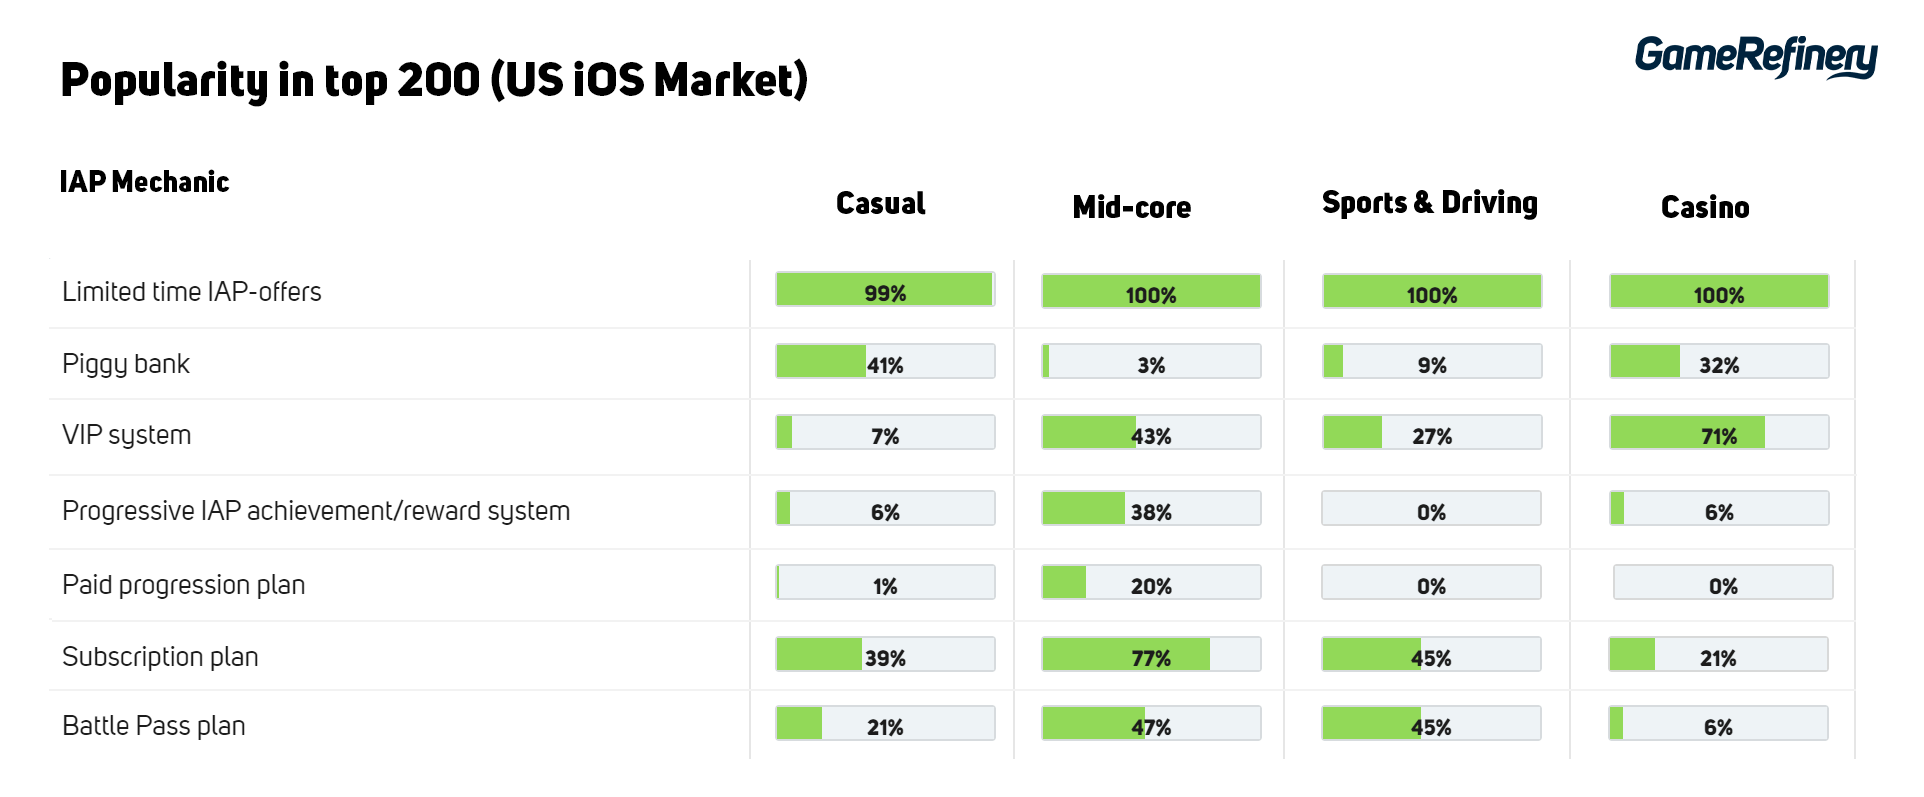 IAP Mechanics popularity in top 200 mobile games US iOS Market